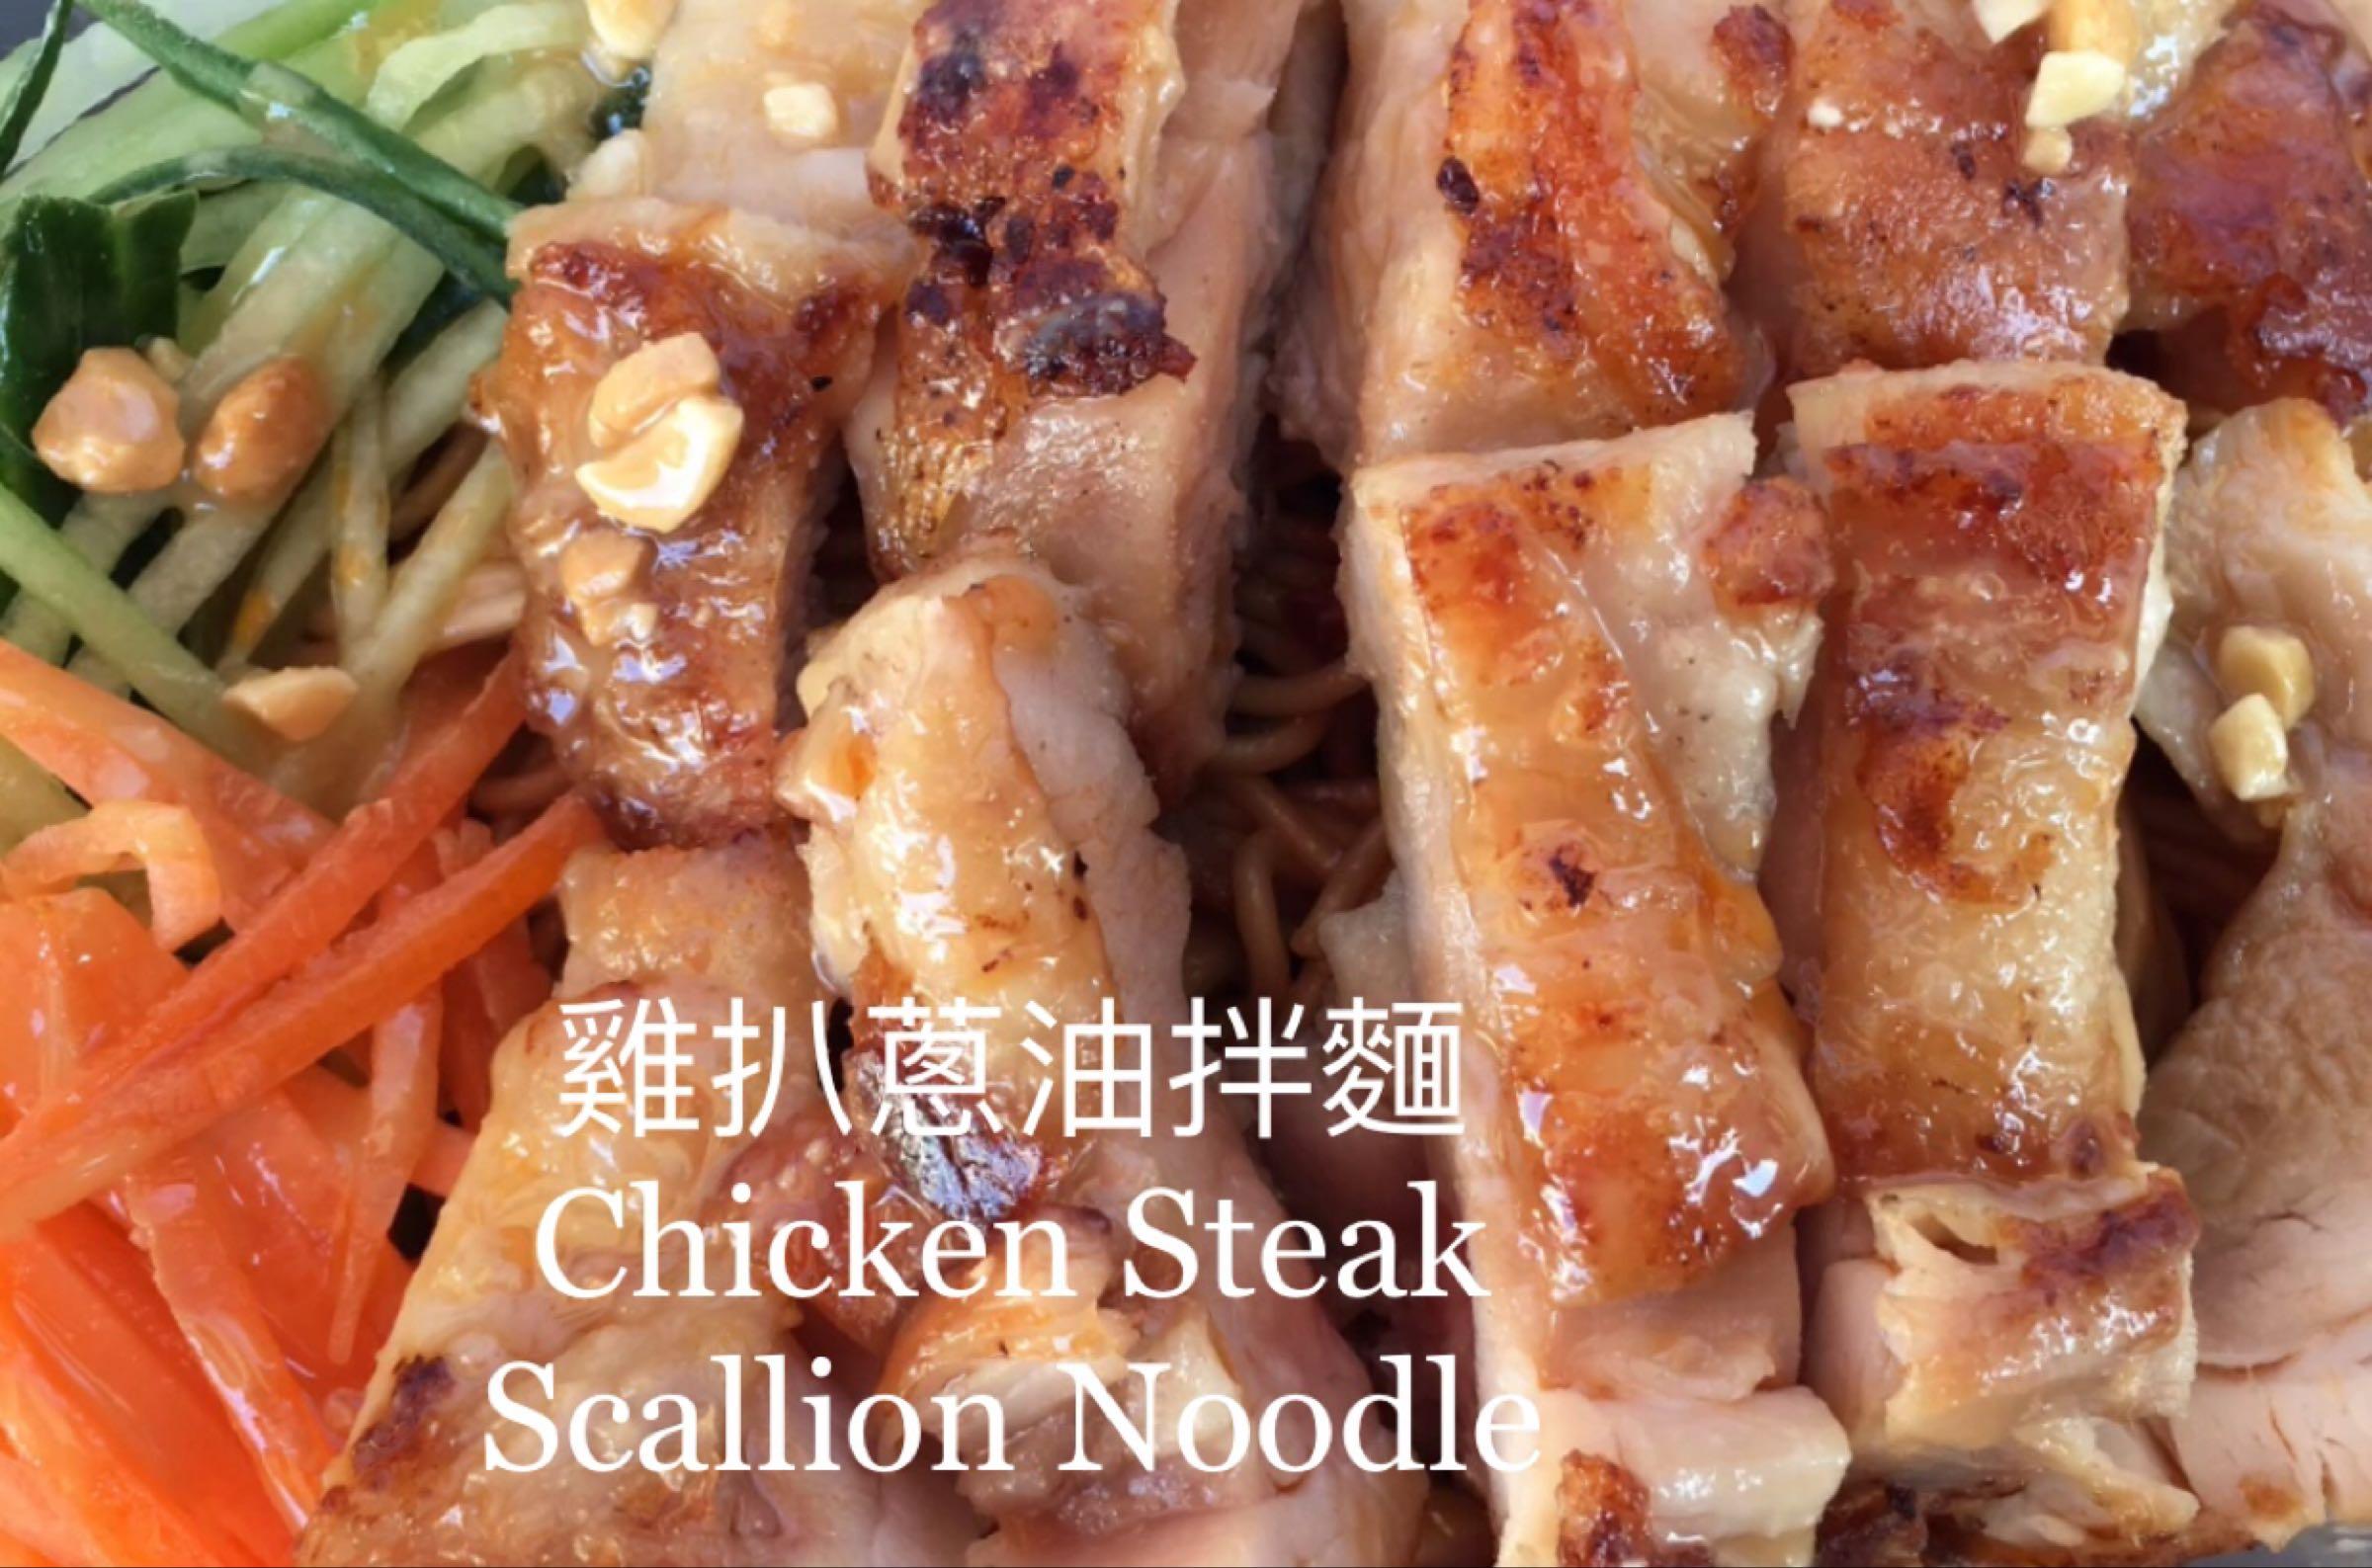 雞扒葱油麵 Chicken Steak Scallion Noodle